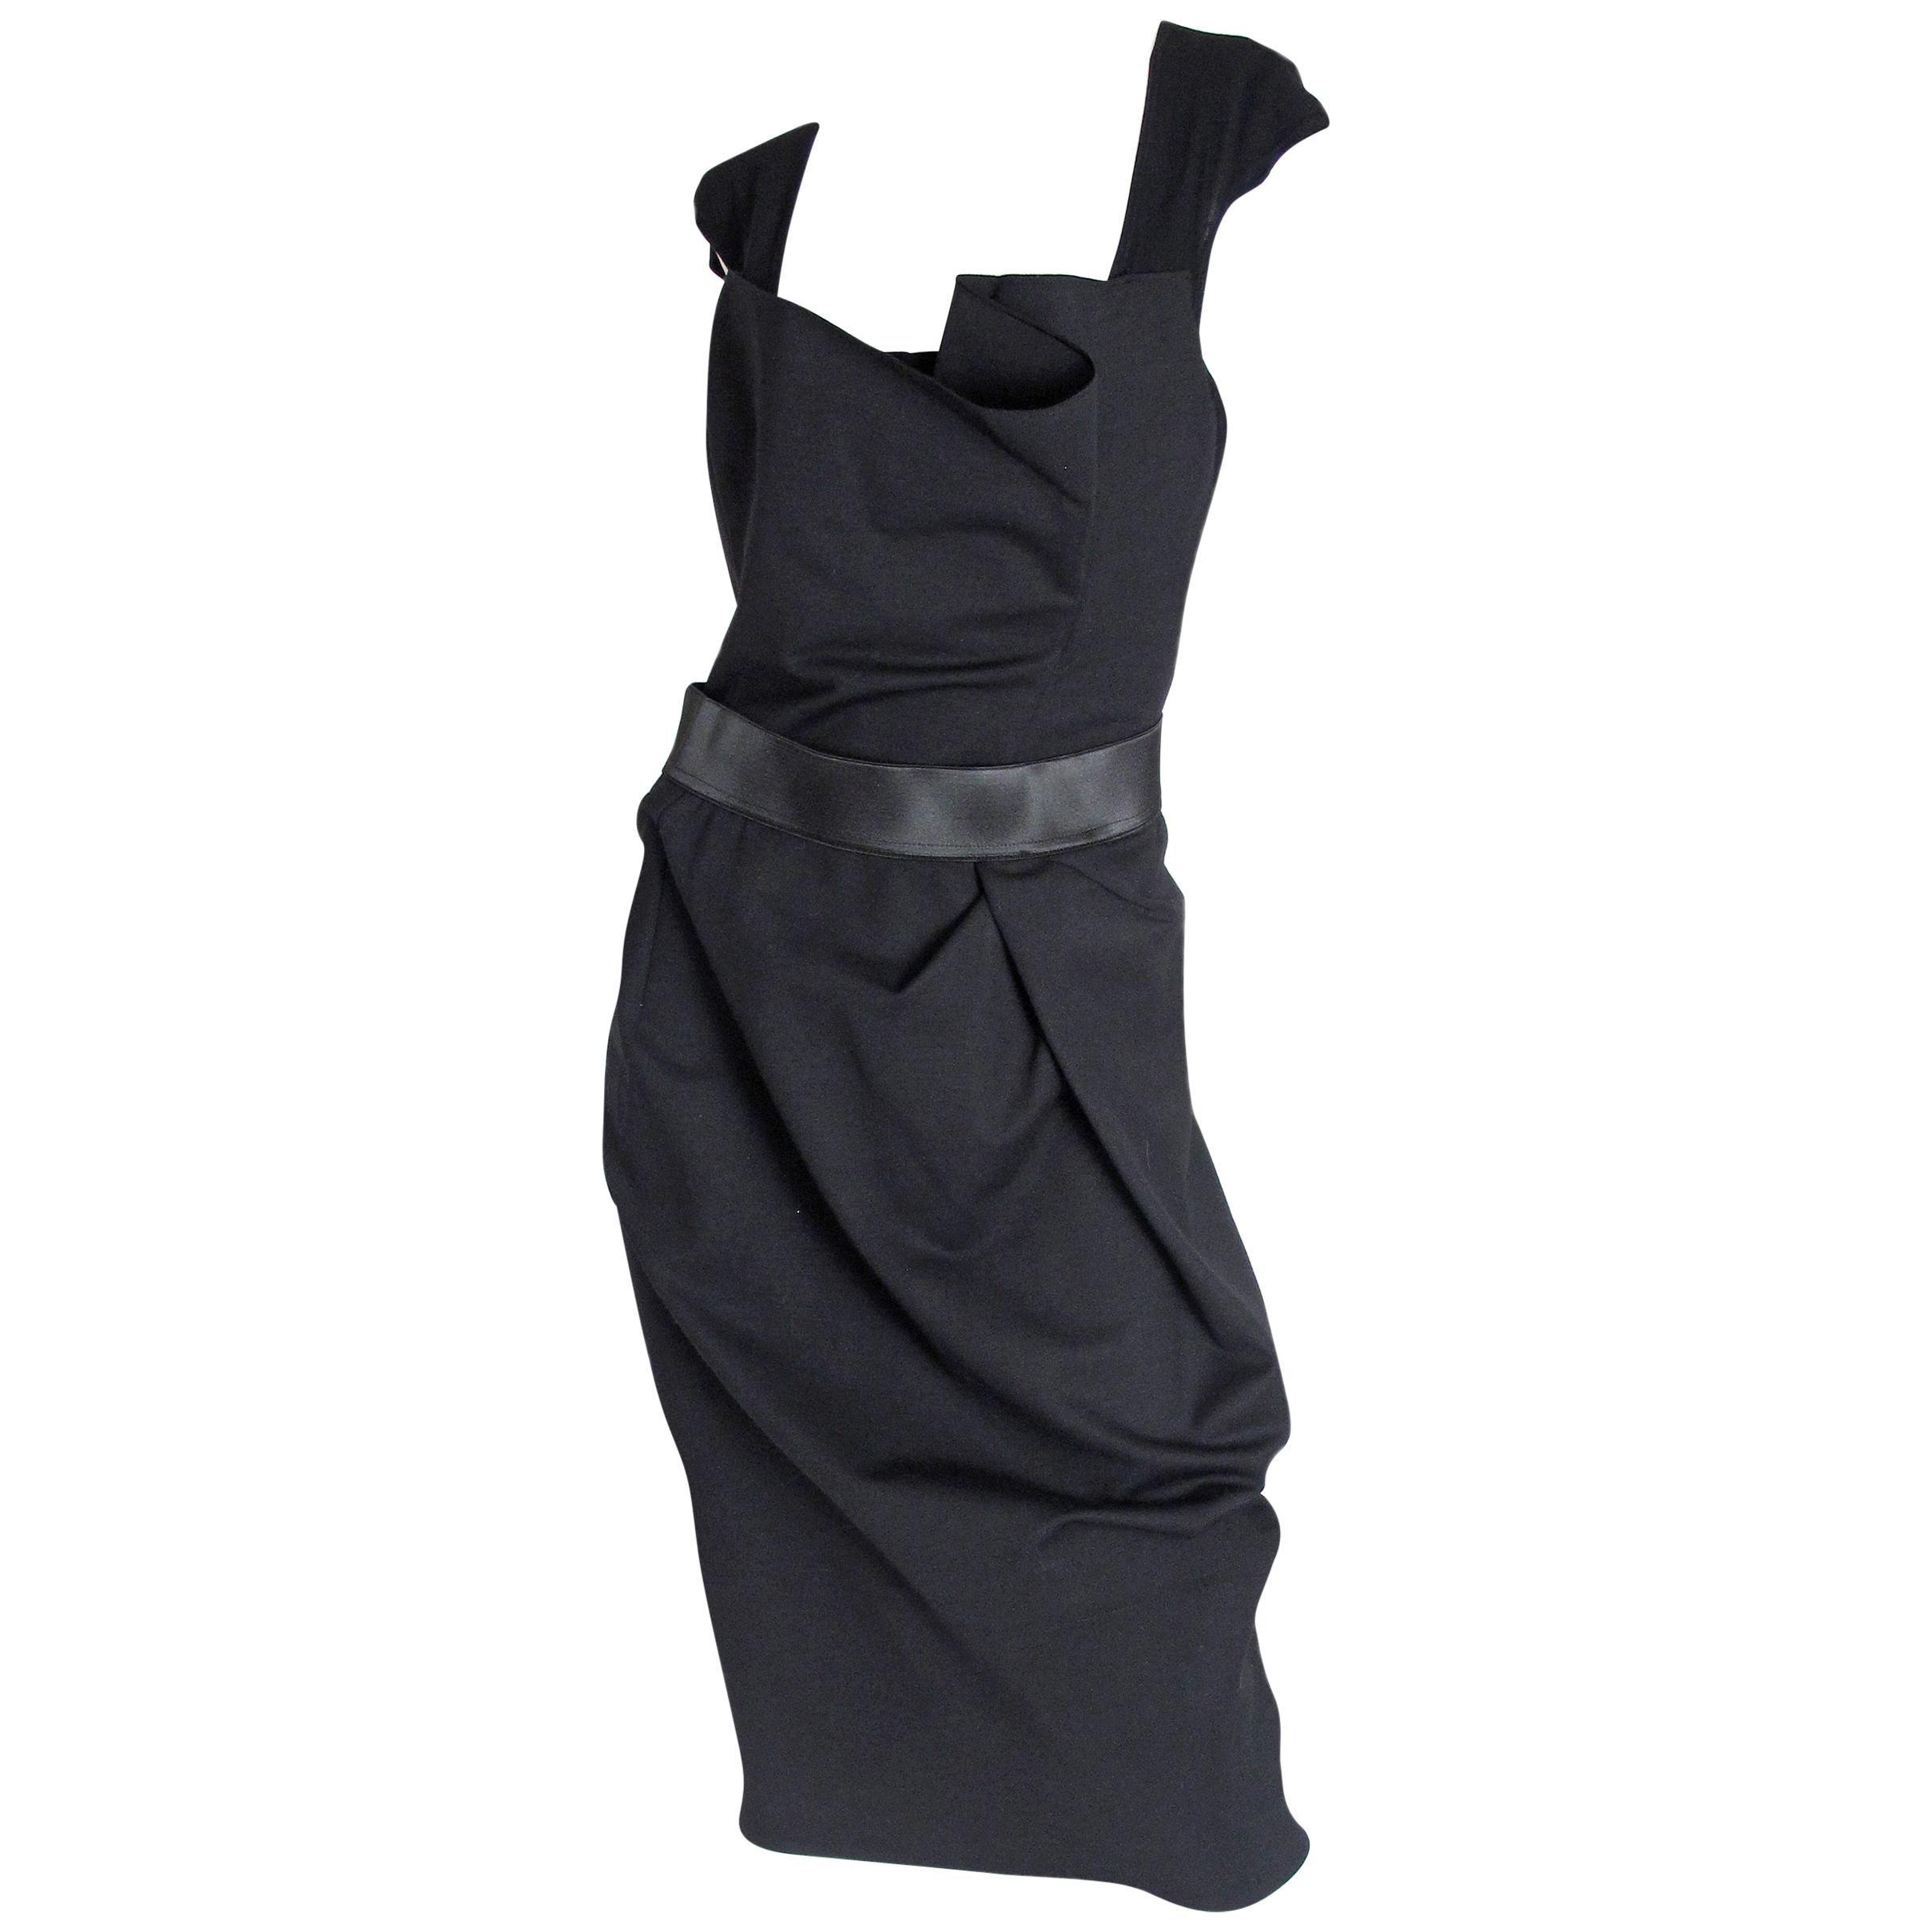 Donna Karen Sleeveless Body Suit and Skirt Set, 1990s